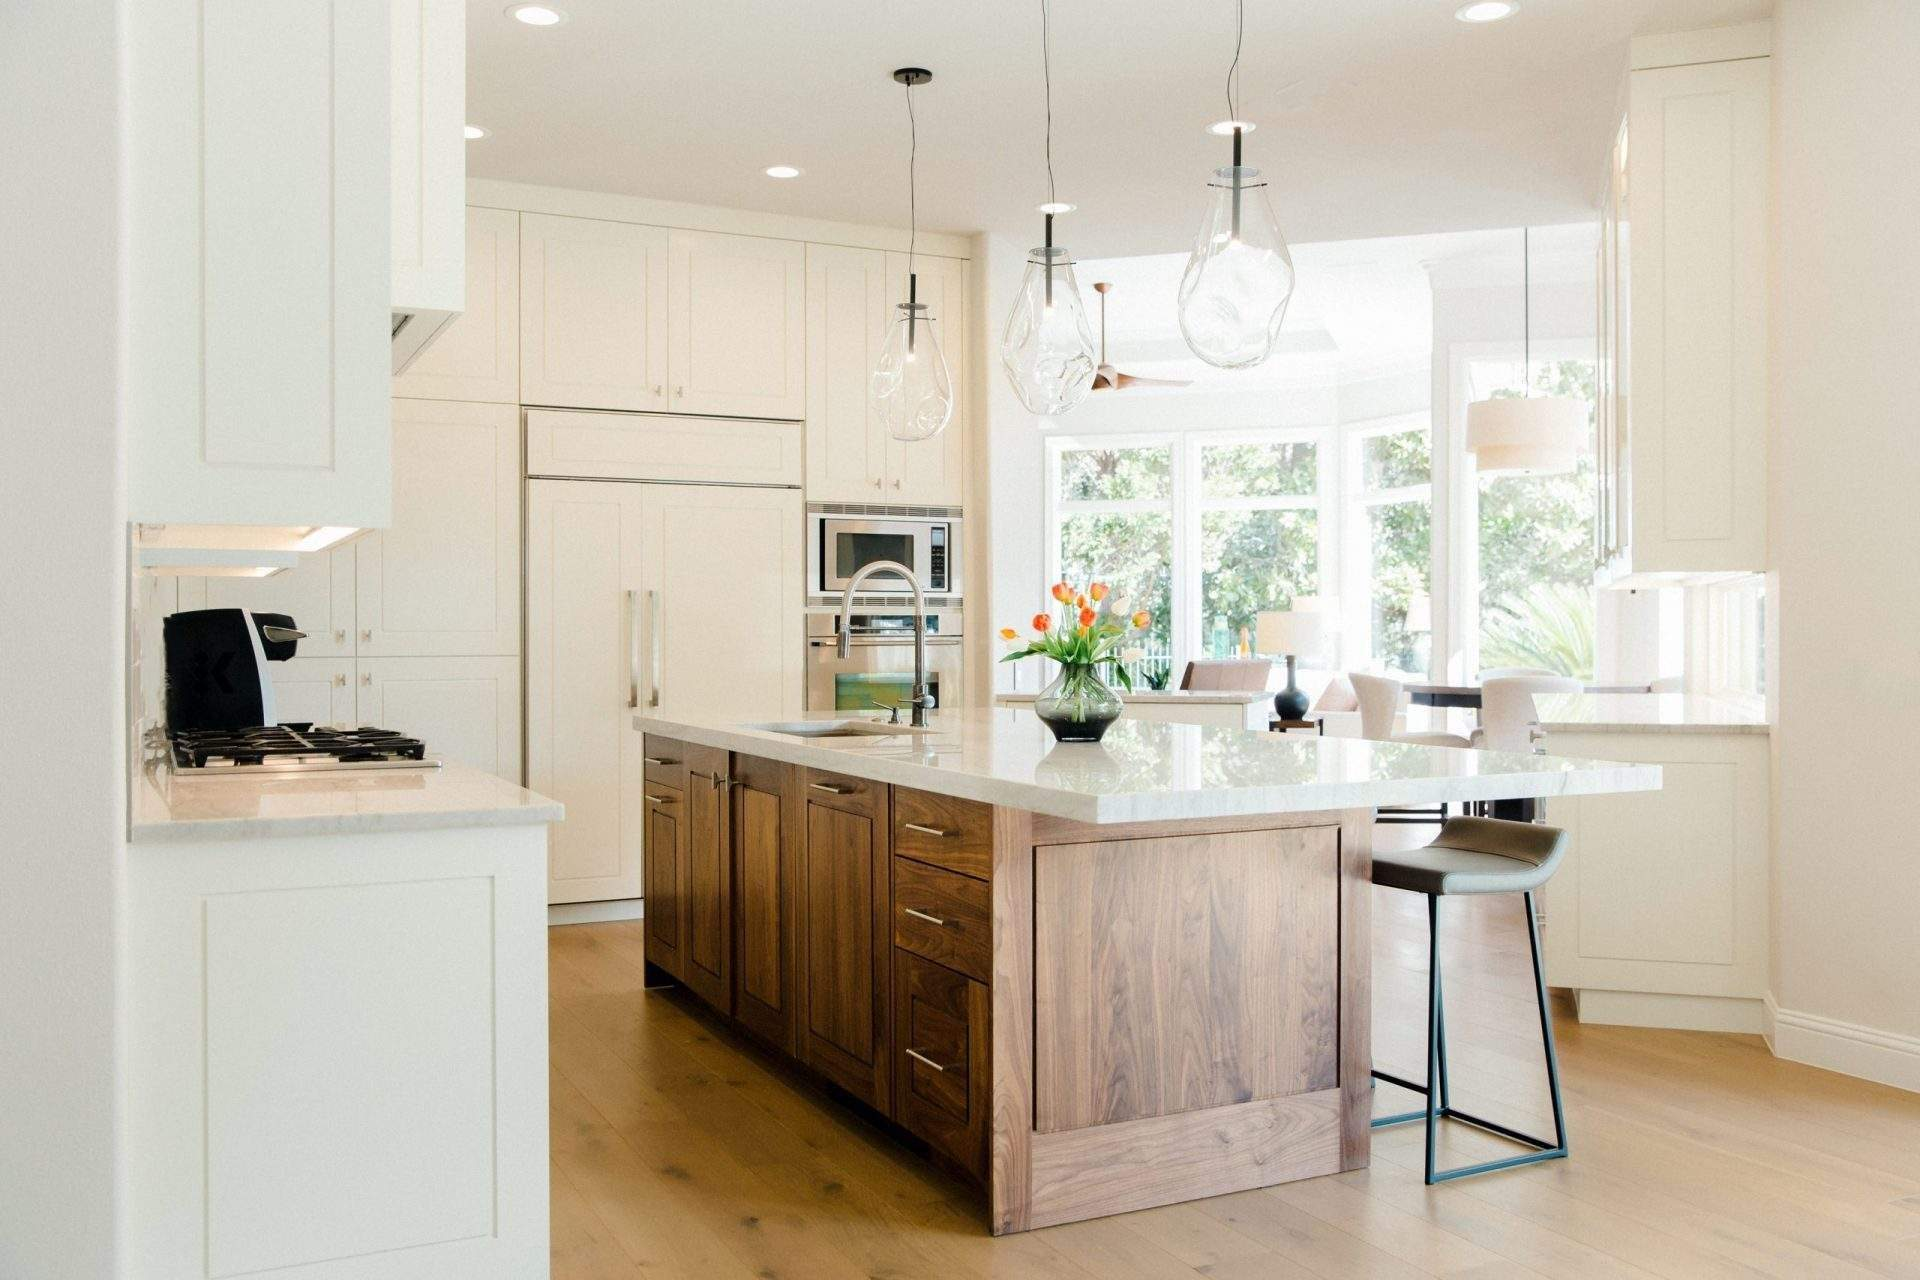 Maravillas - Austin residential interior design | kitchen remodel | austin, texas